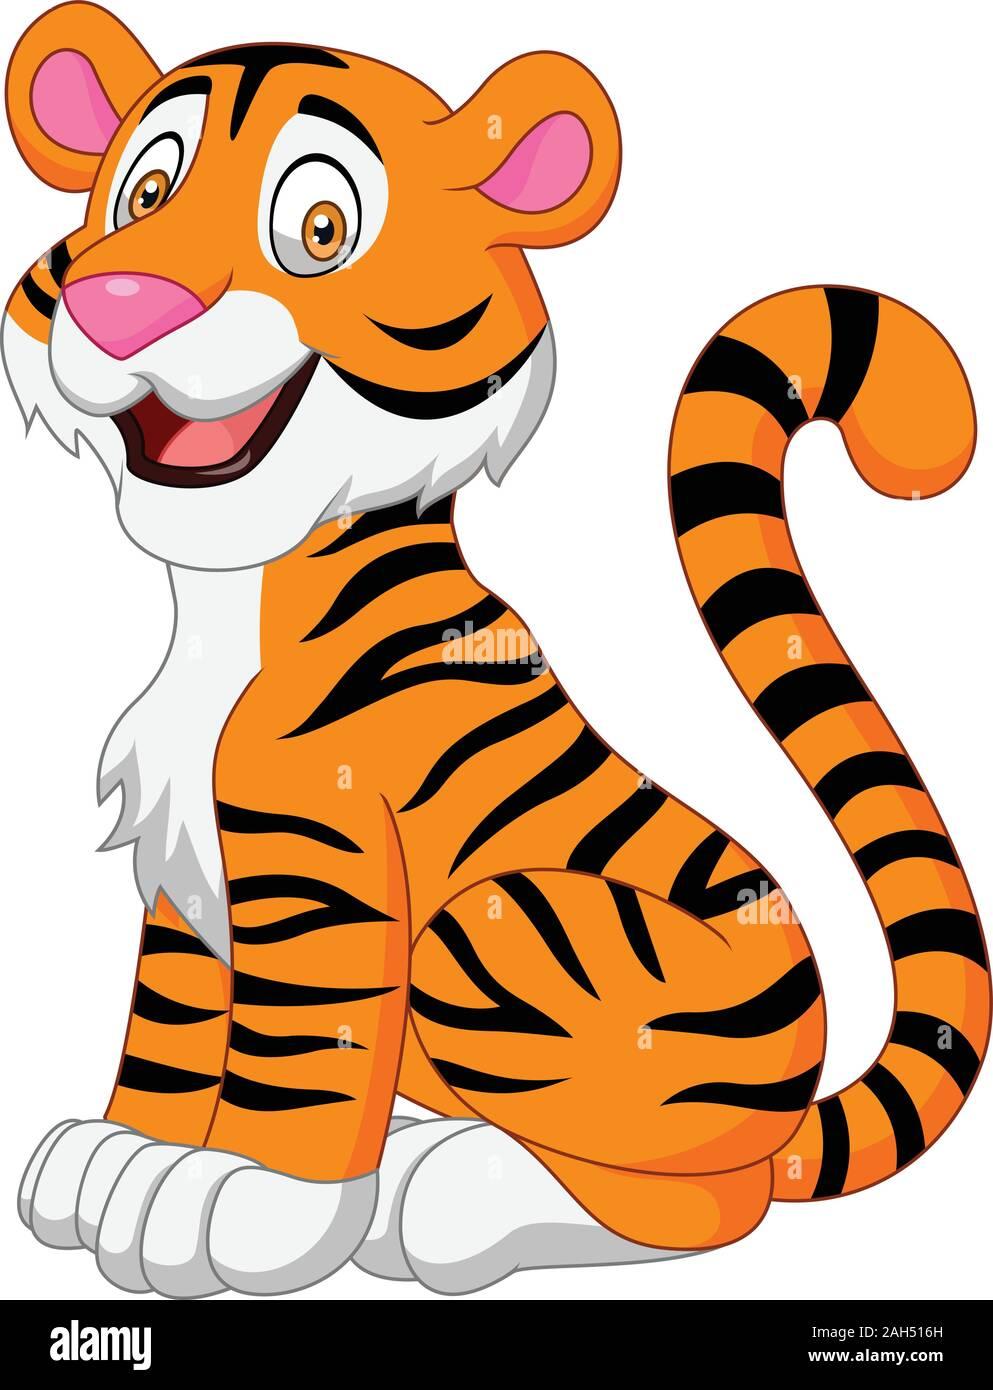 Cartoon Smiling Tiger Stock Vector Image Art Alamy